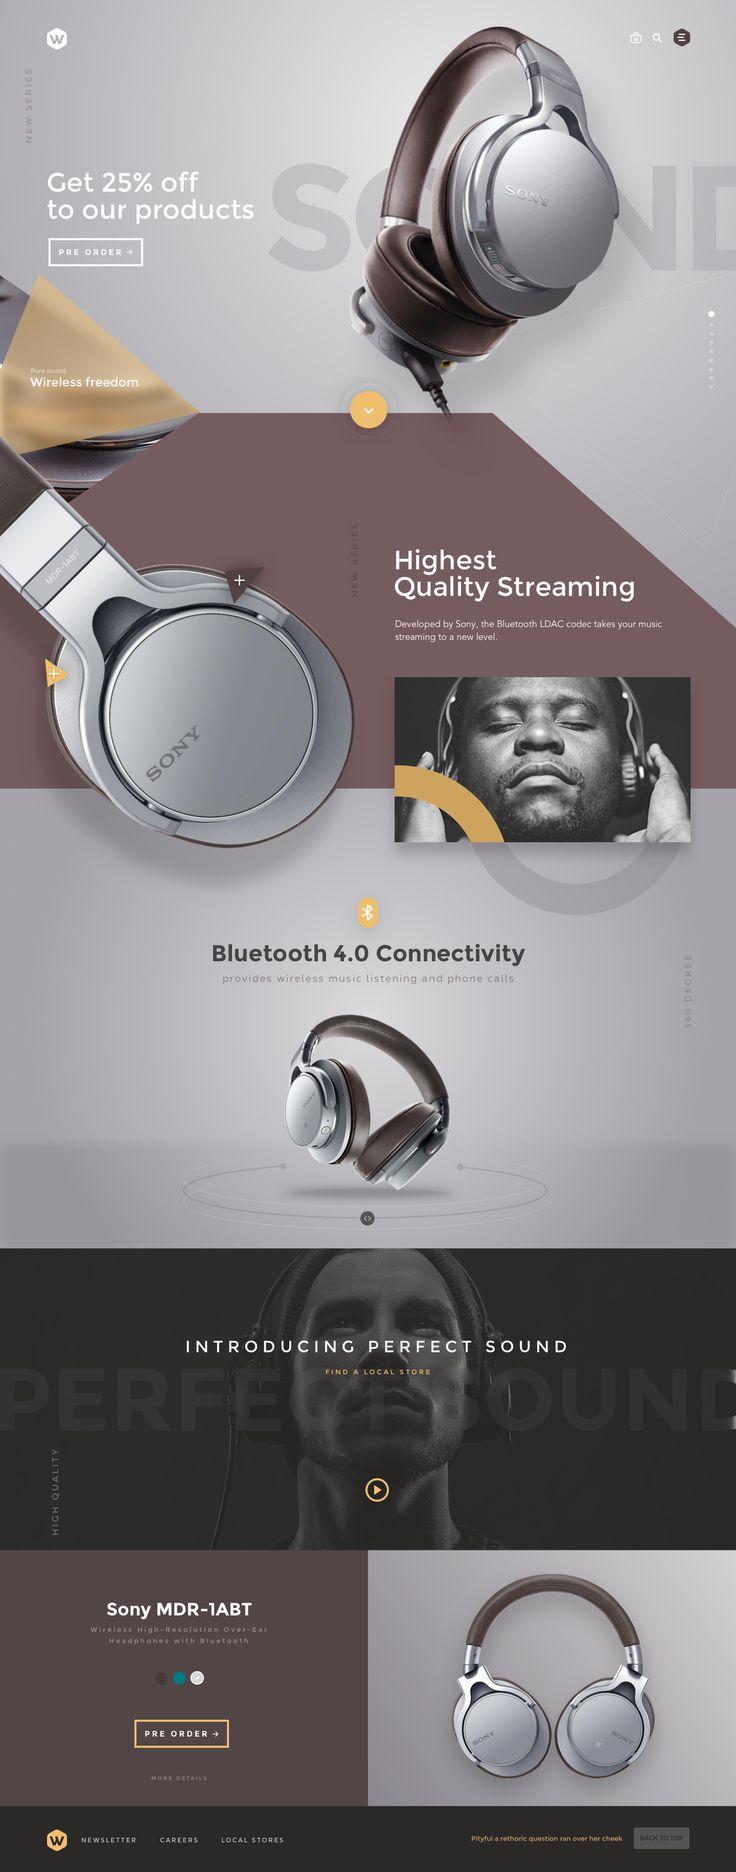 Headphones by Sencer on